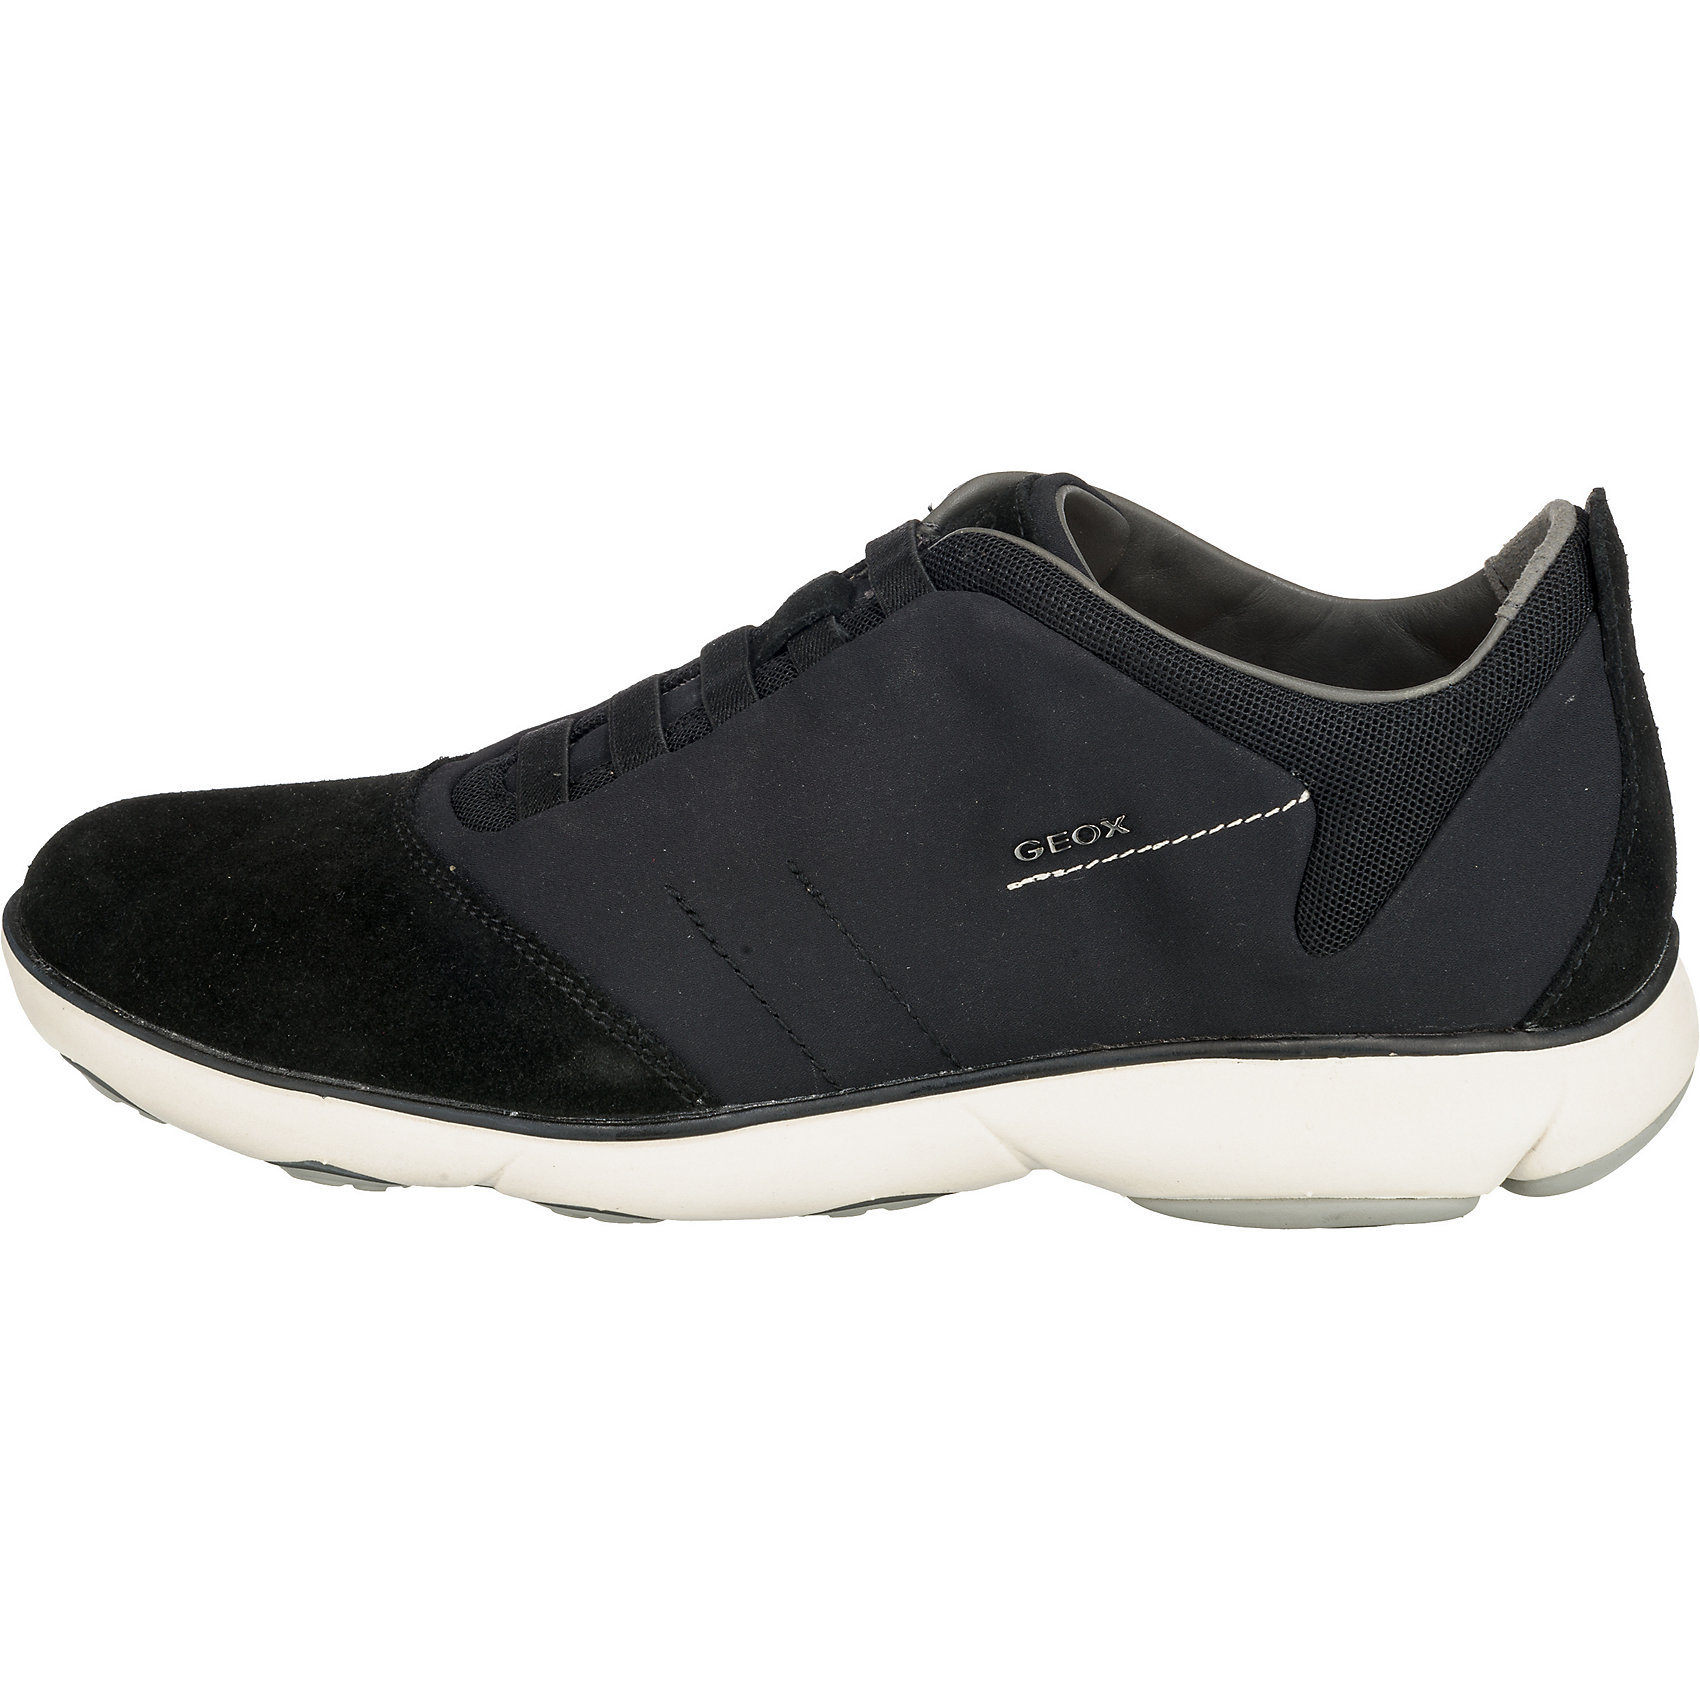 Neu GEOX Nebula Sneakers Low 7452938 für Herren schwarz